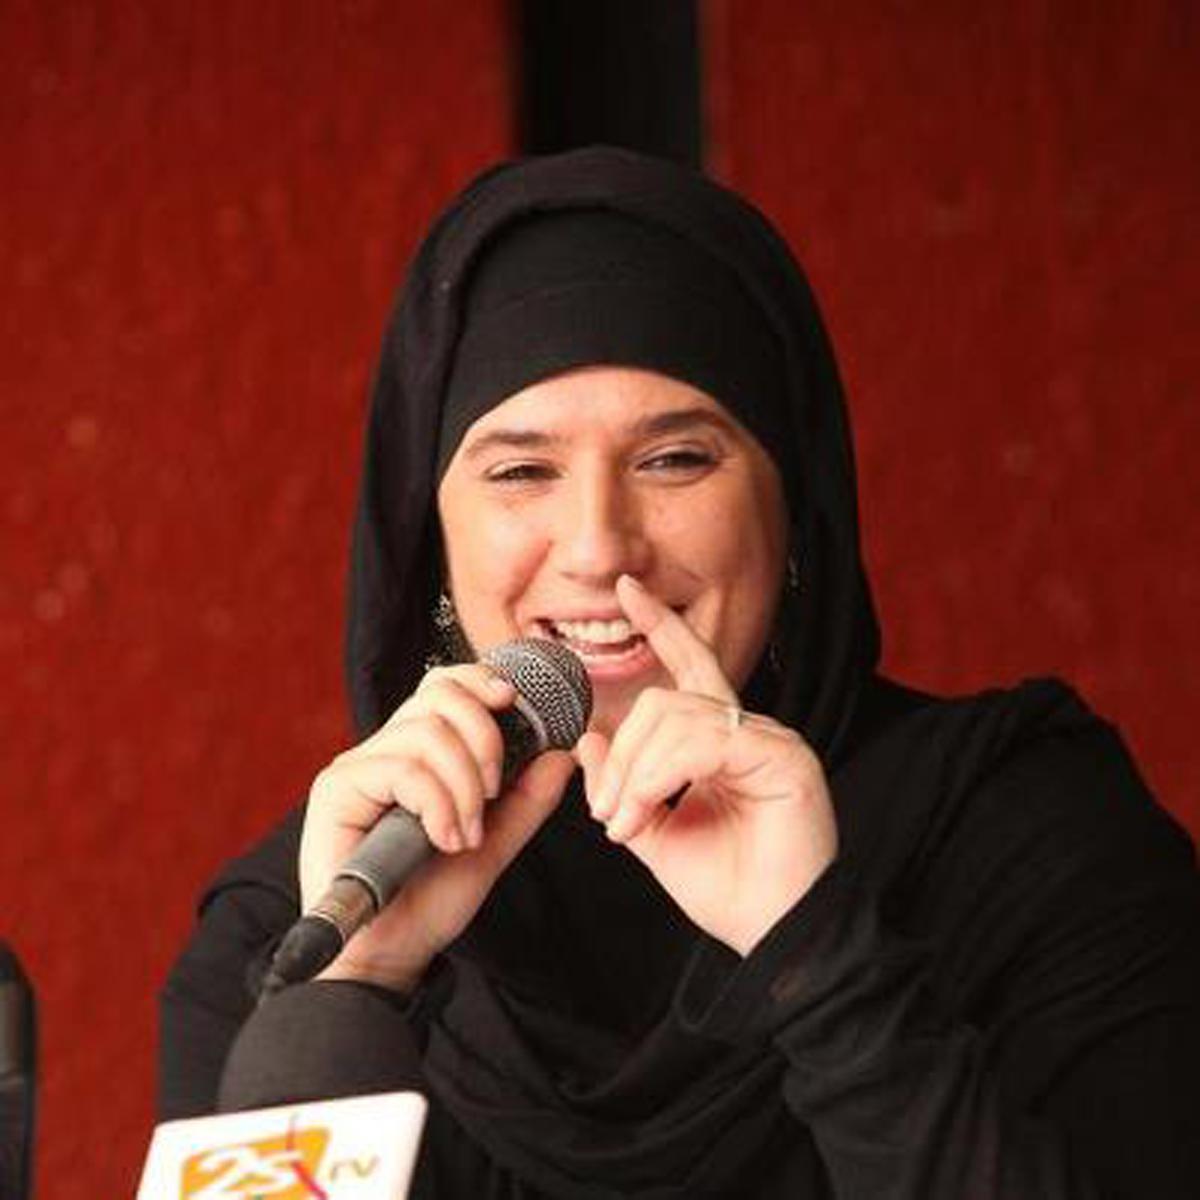 Gio Komputer: Rapper Wanita Berjilbab